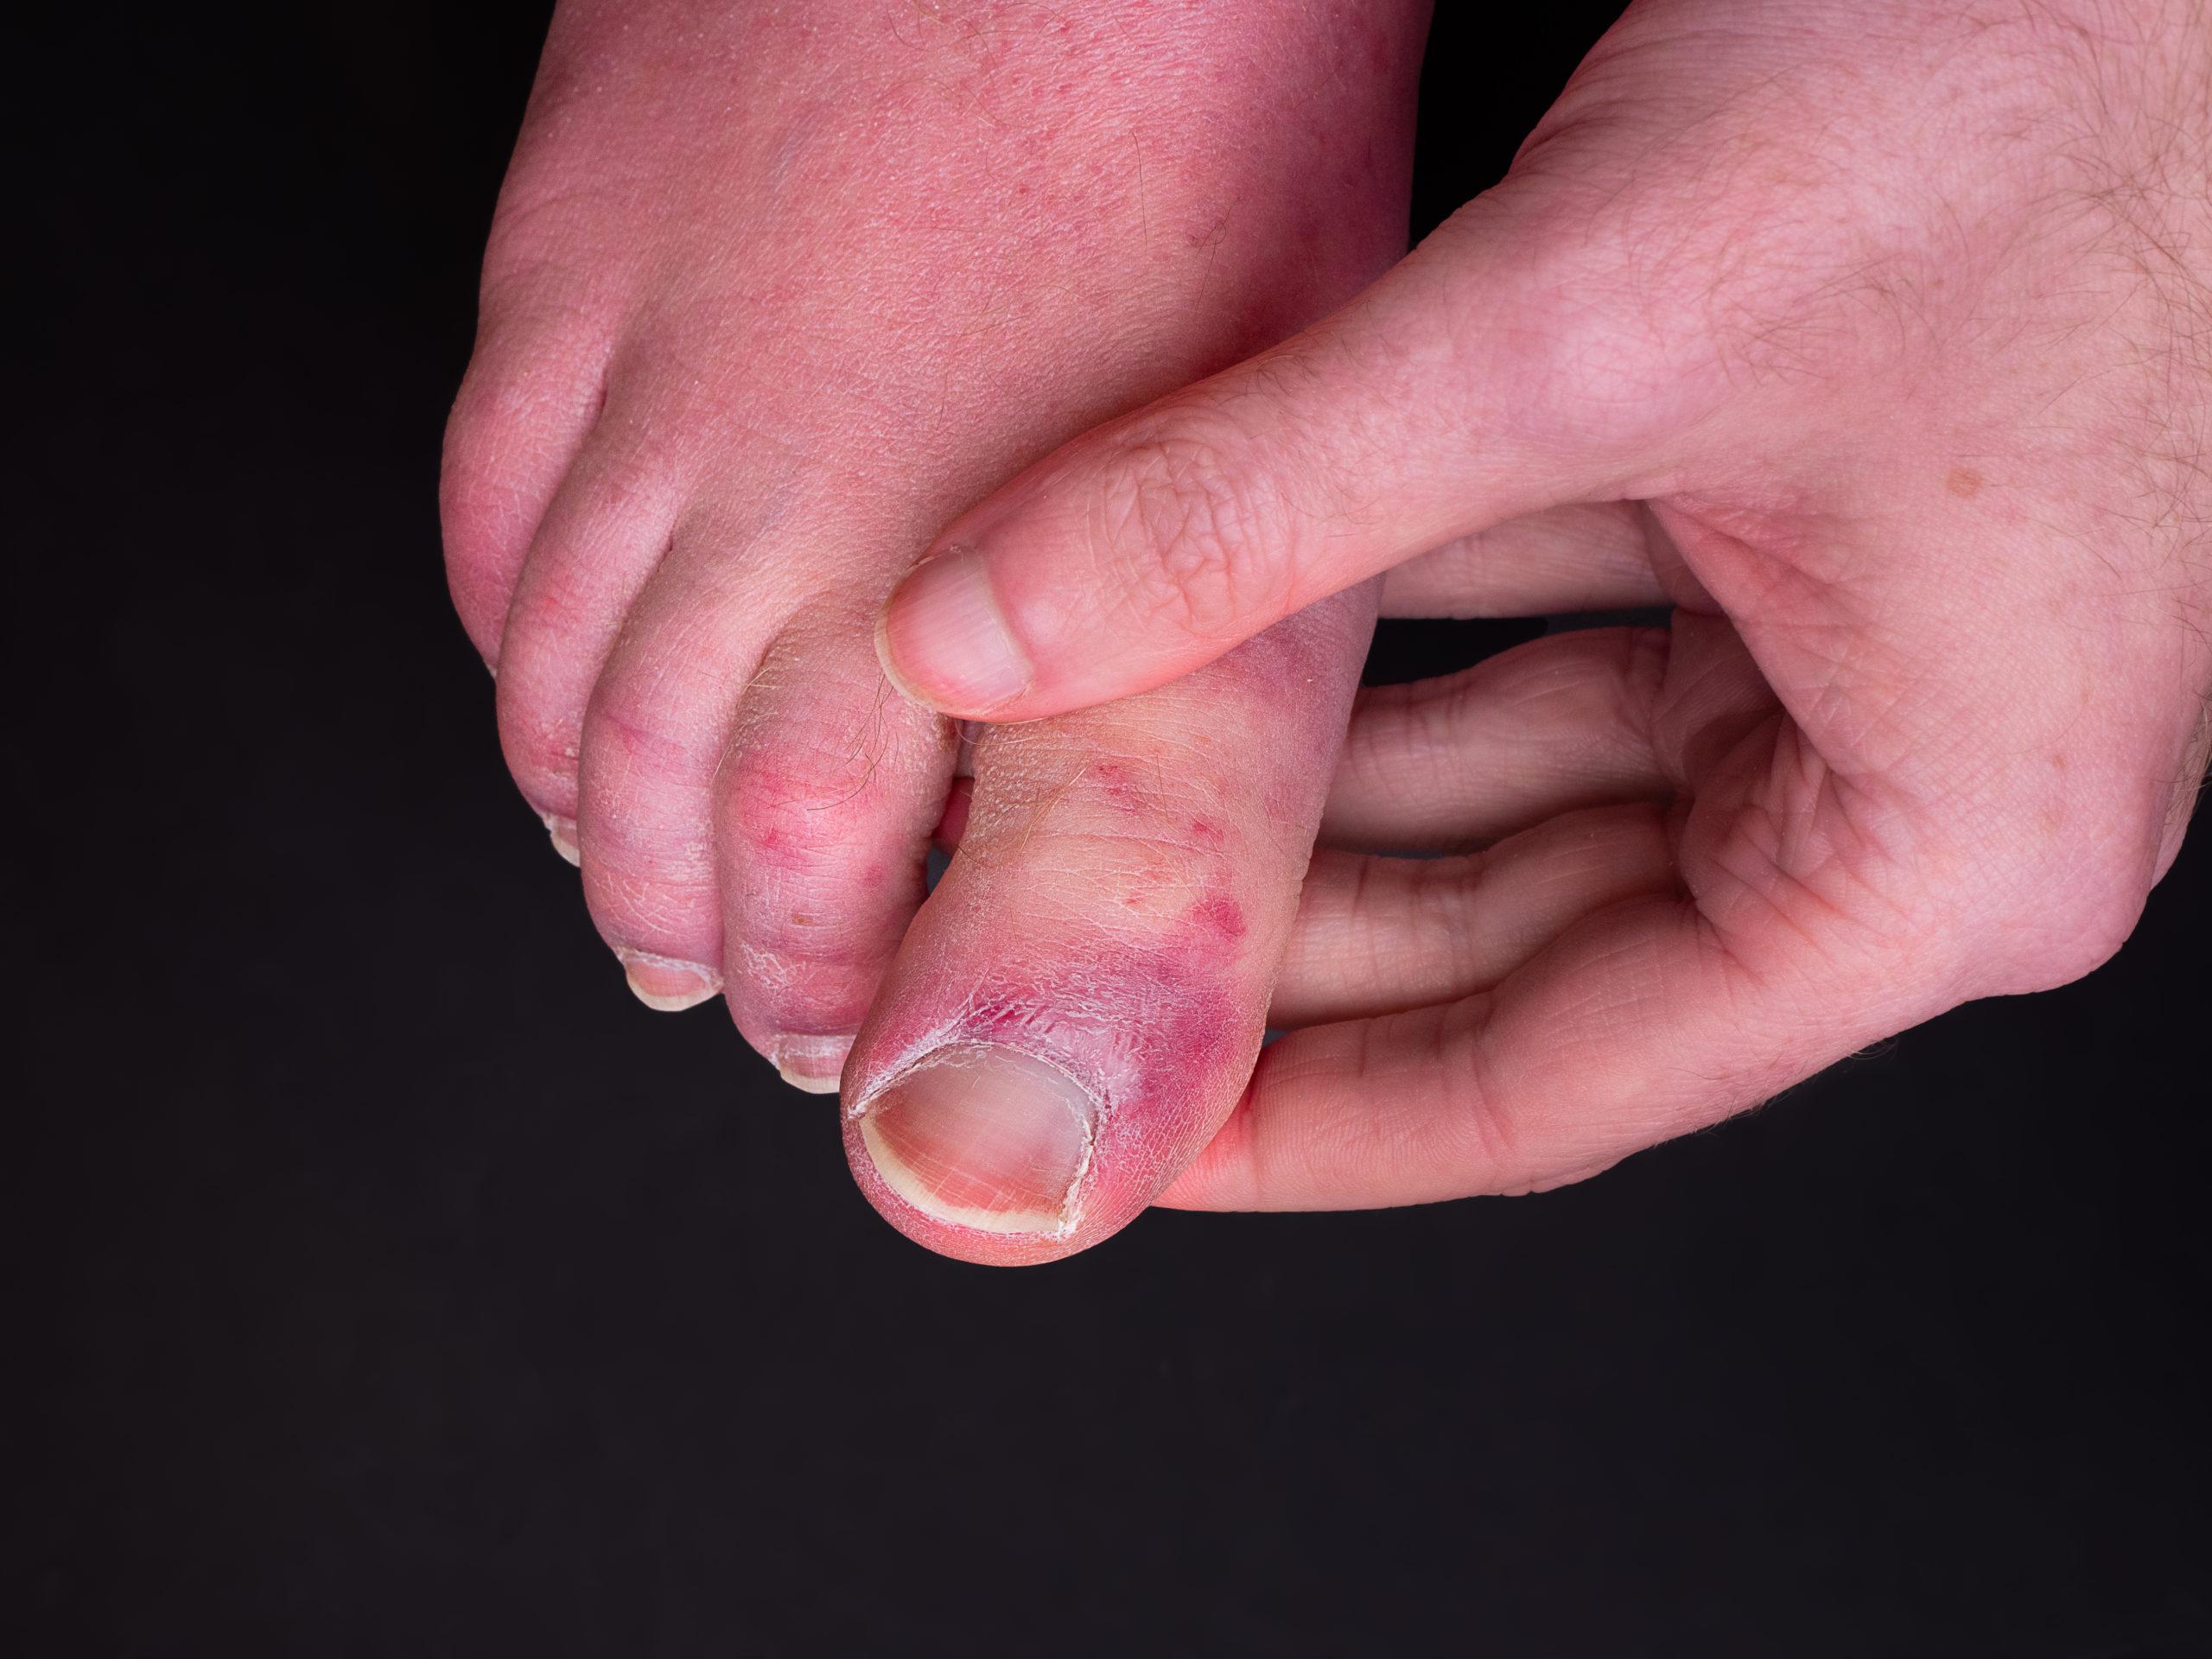 Dark spots on toes